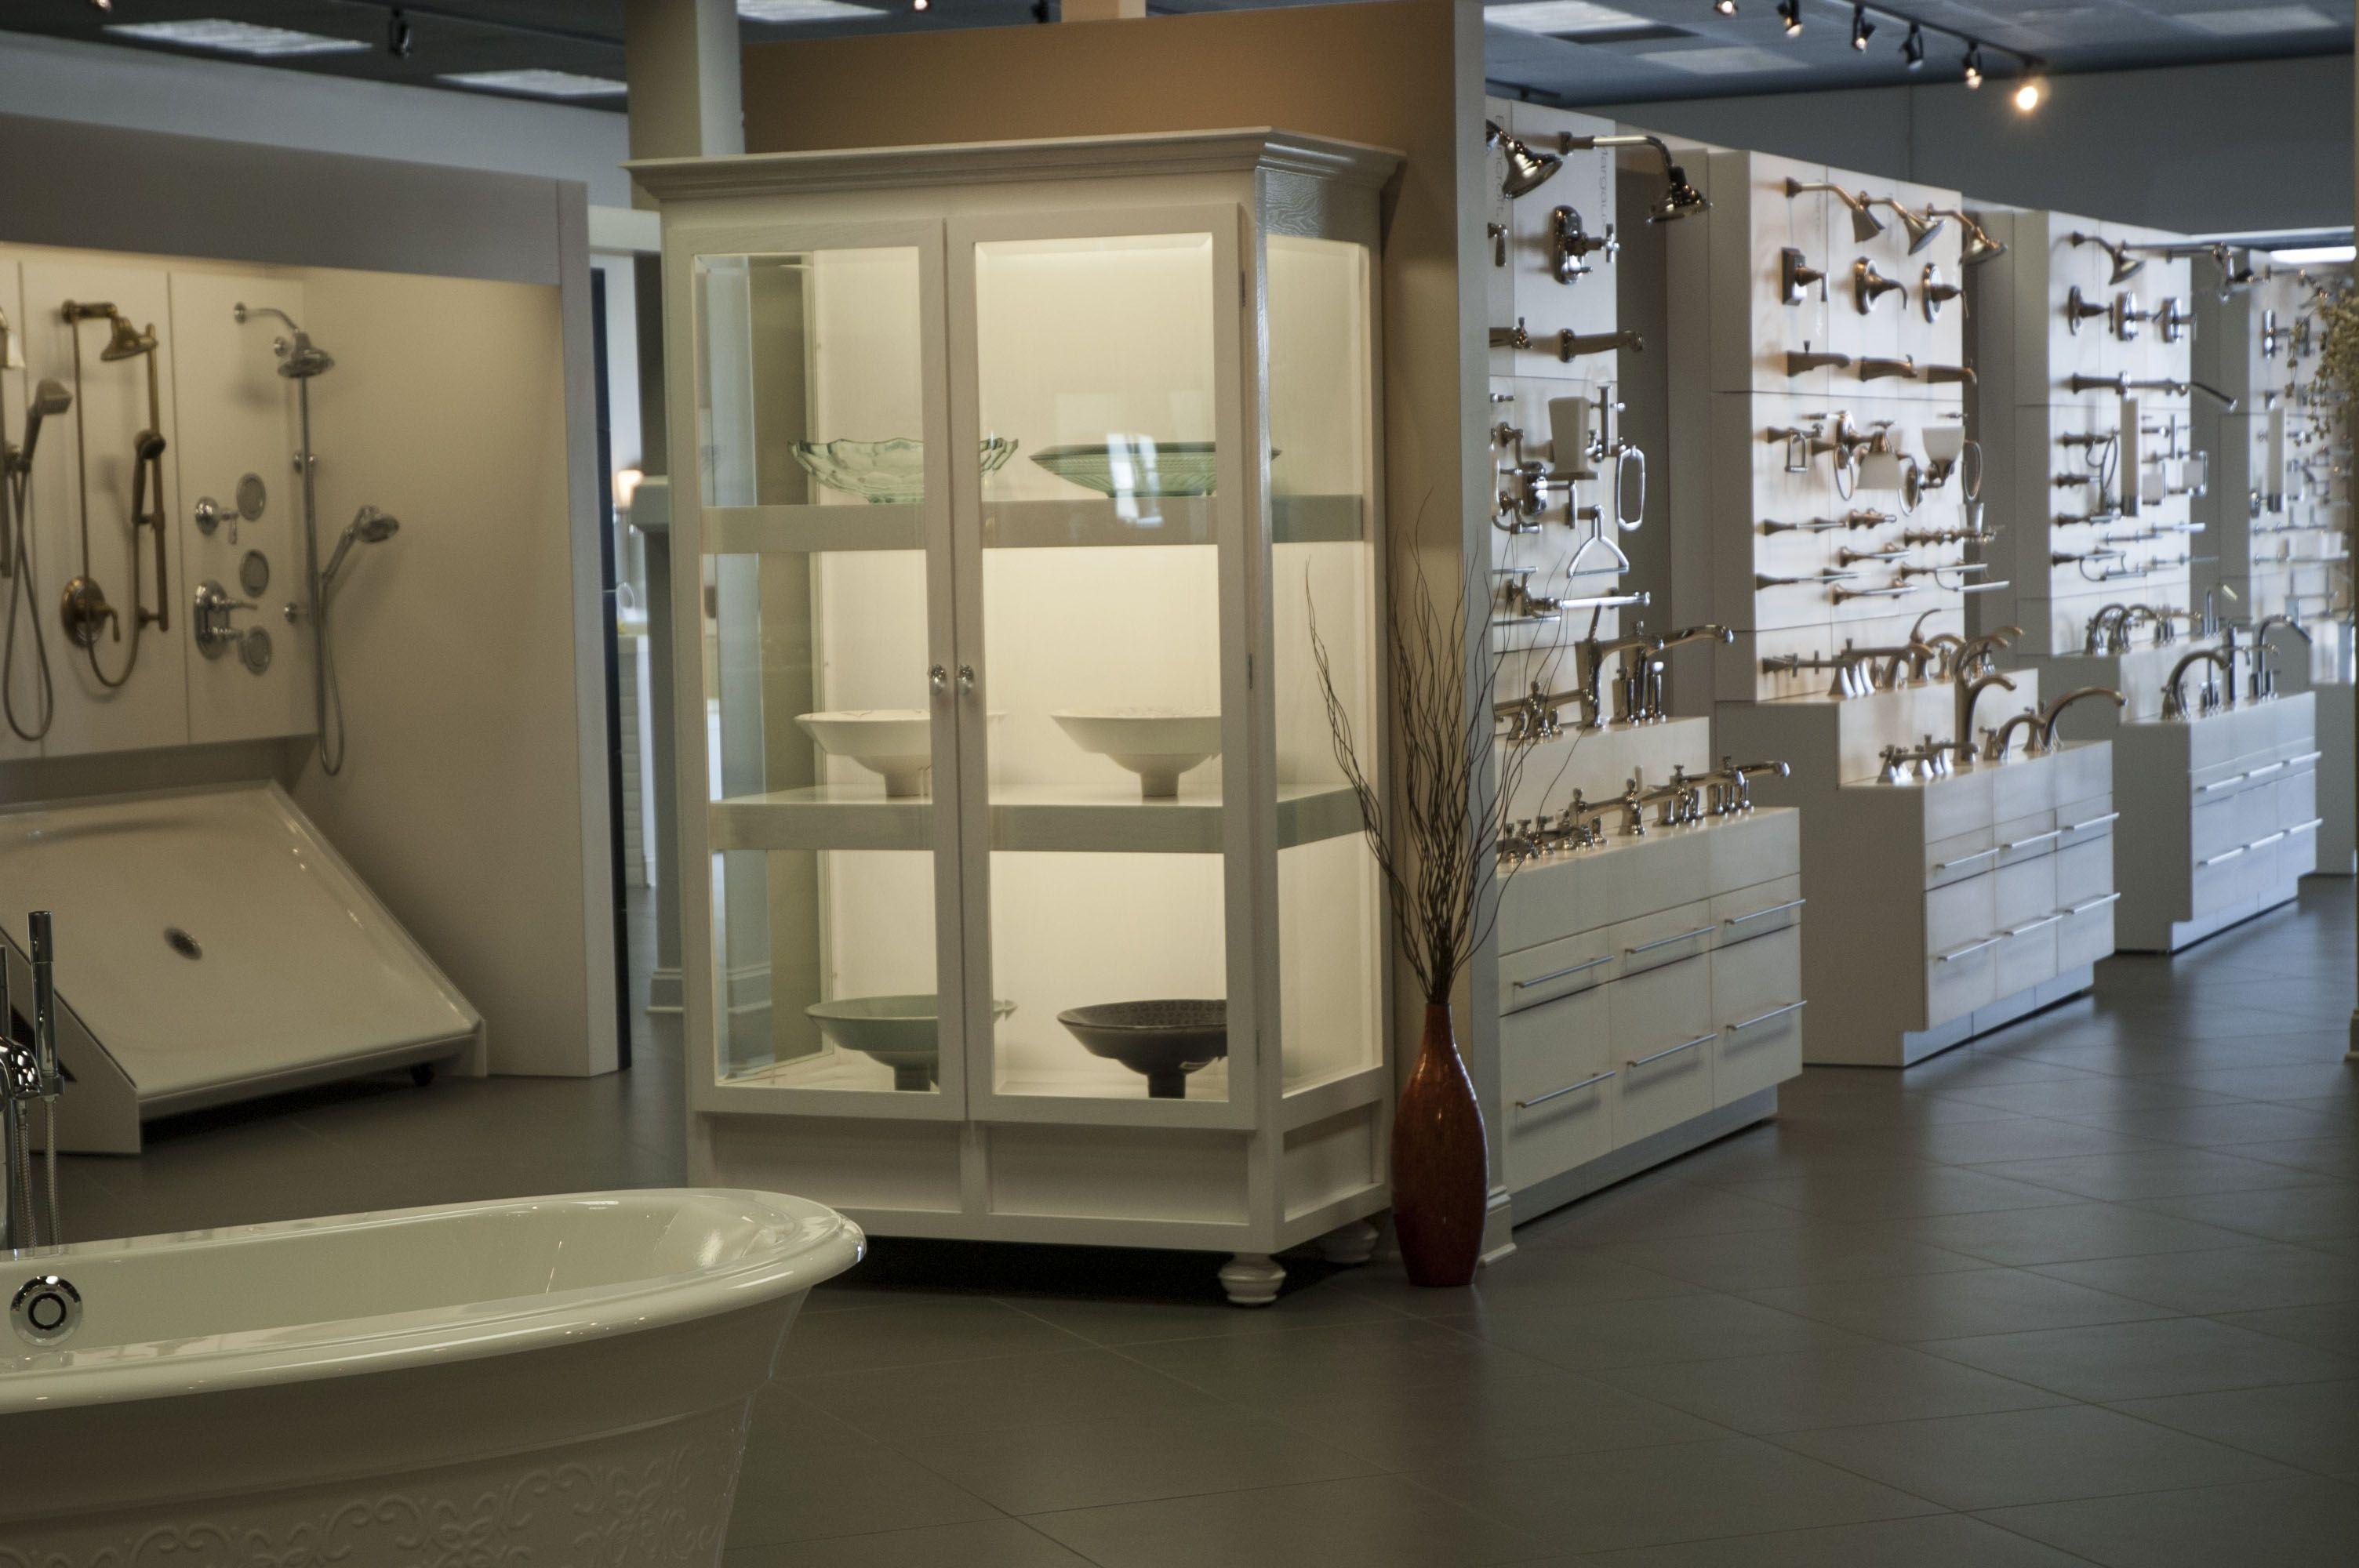 Inspired Kitchen Bath Featuring Stunning Lifestyle Displays